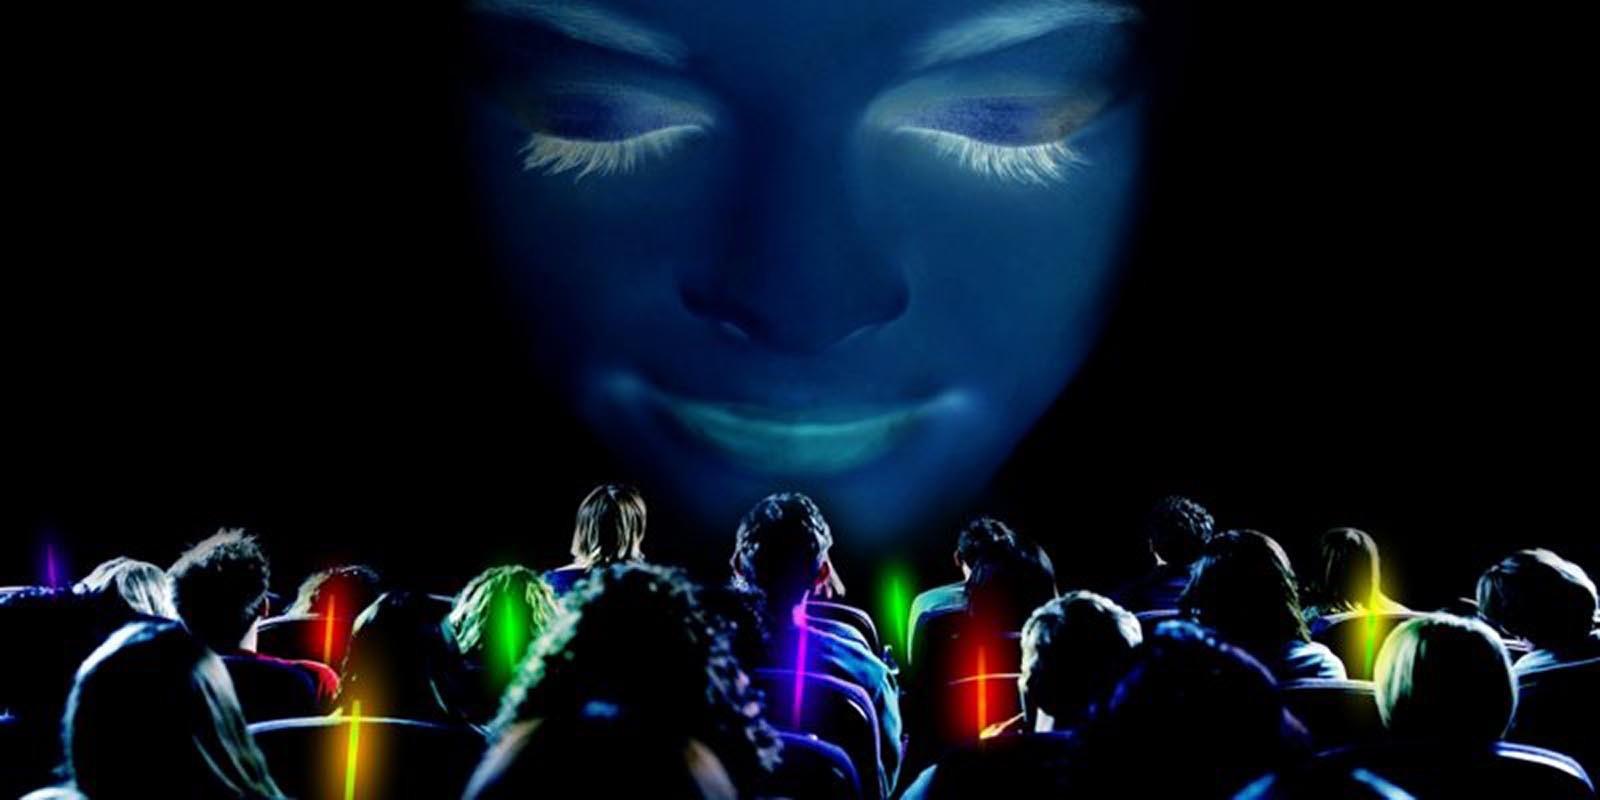 Vsichni se ladi na stejnou vlnu v meditacnim programu Meditainment na podporu soustredeni